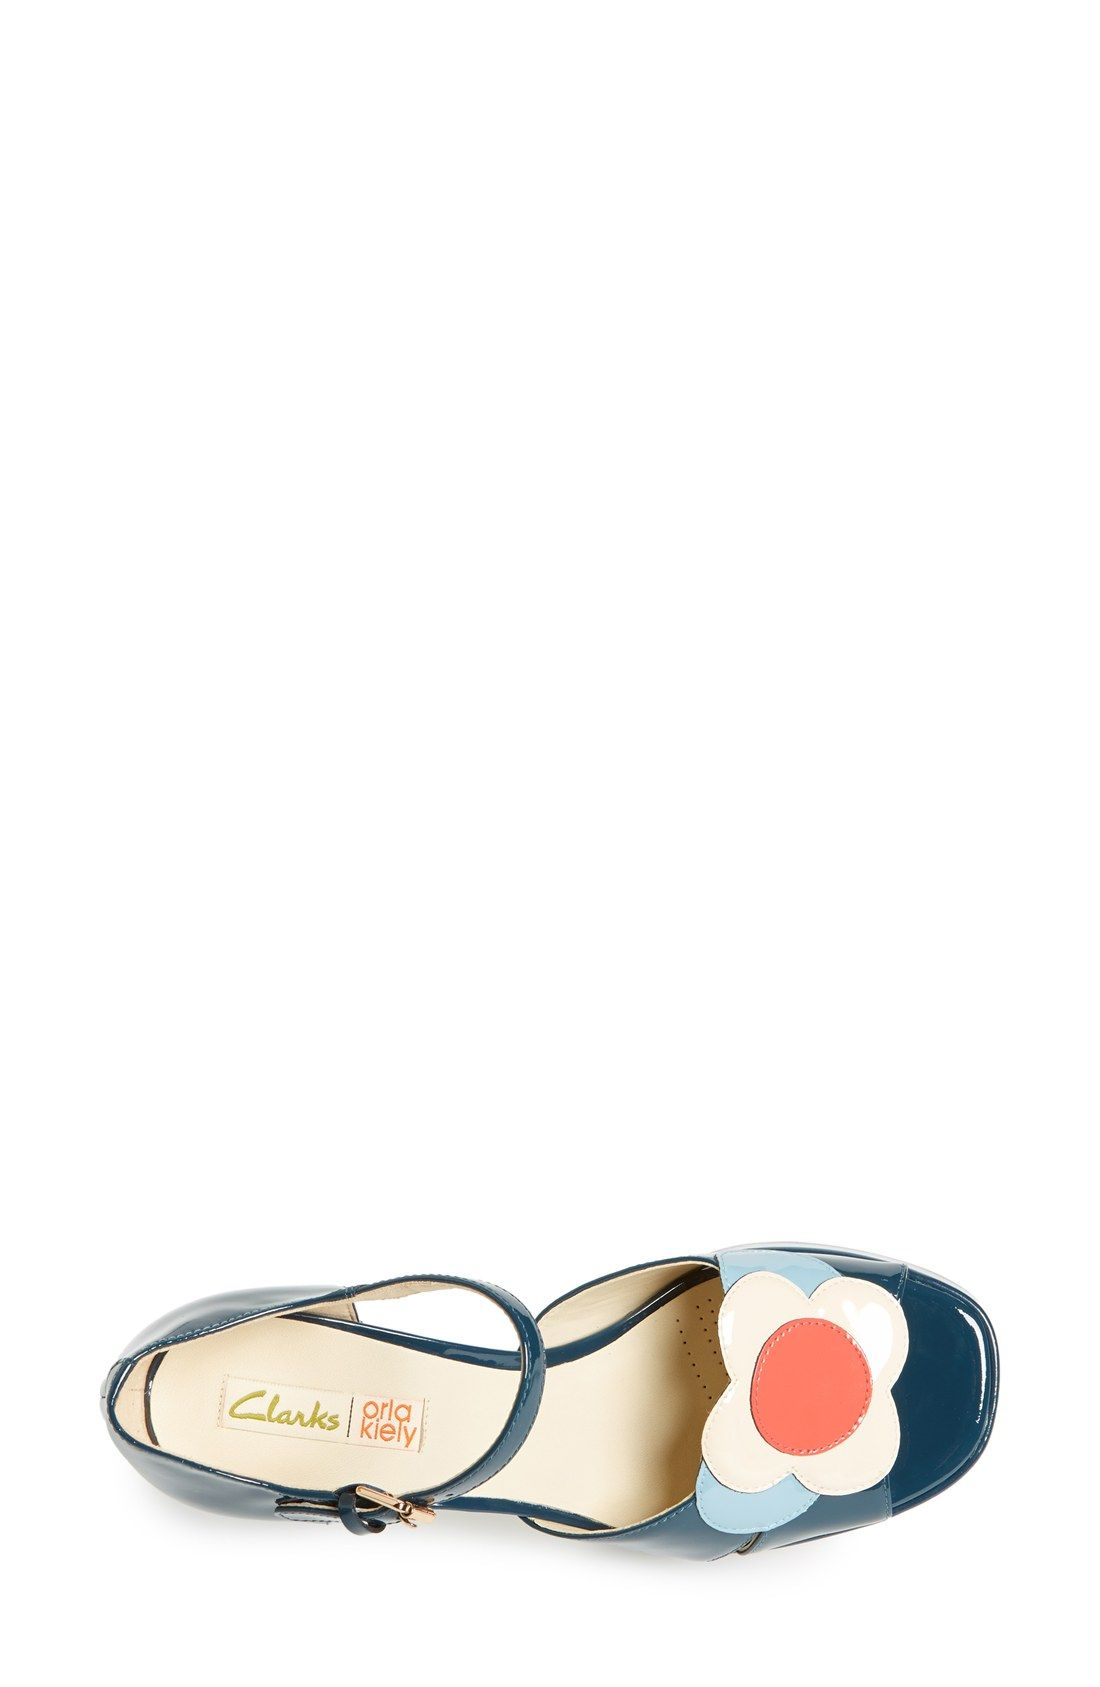 Clarks® x Orla Kiely 'Betty' Patent Leather Platform Sandal (Women)